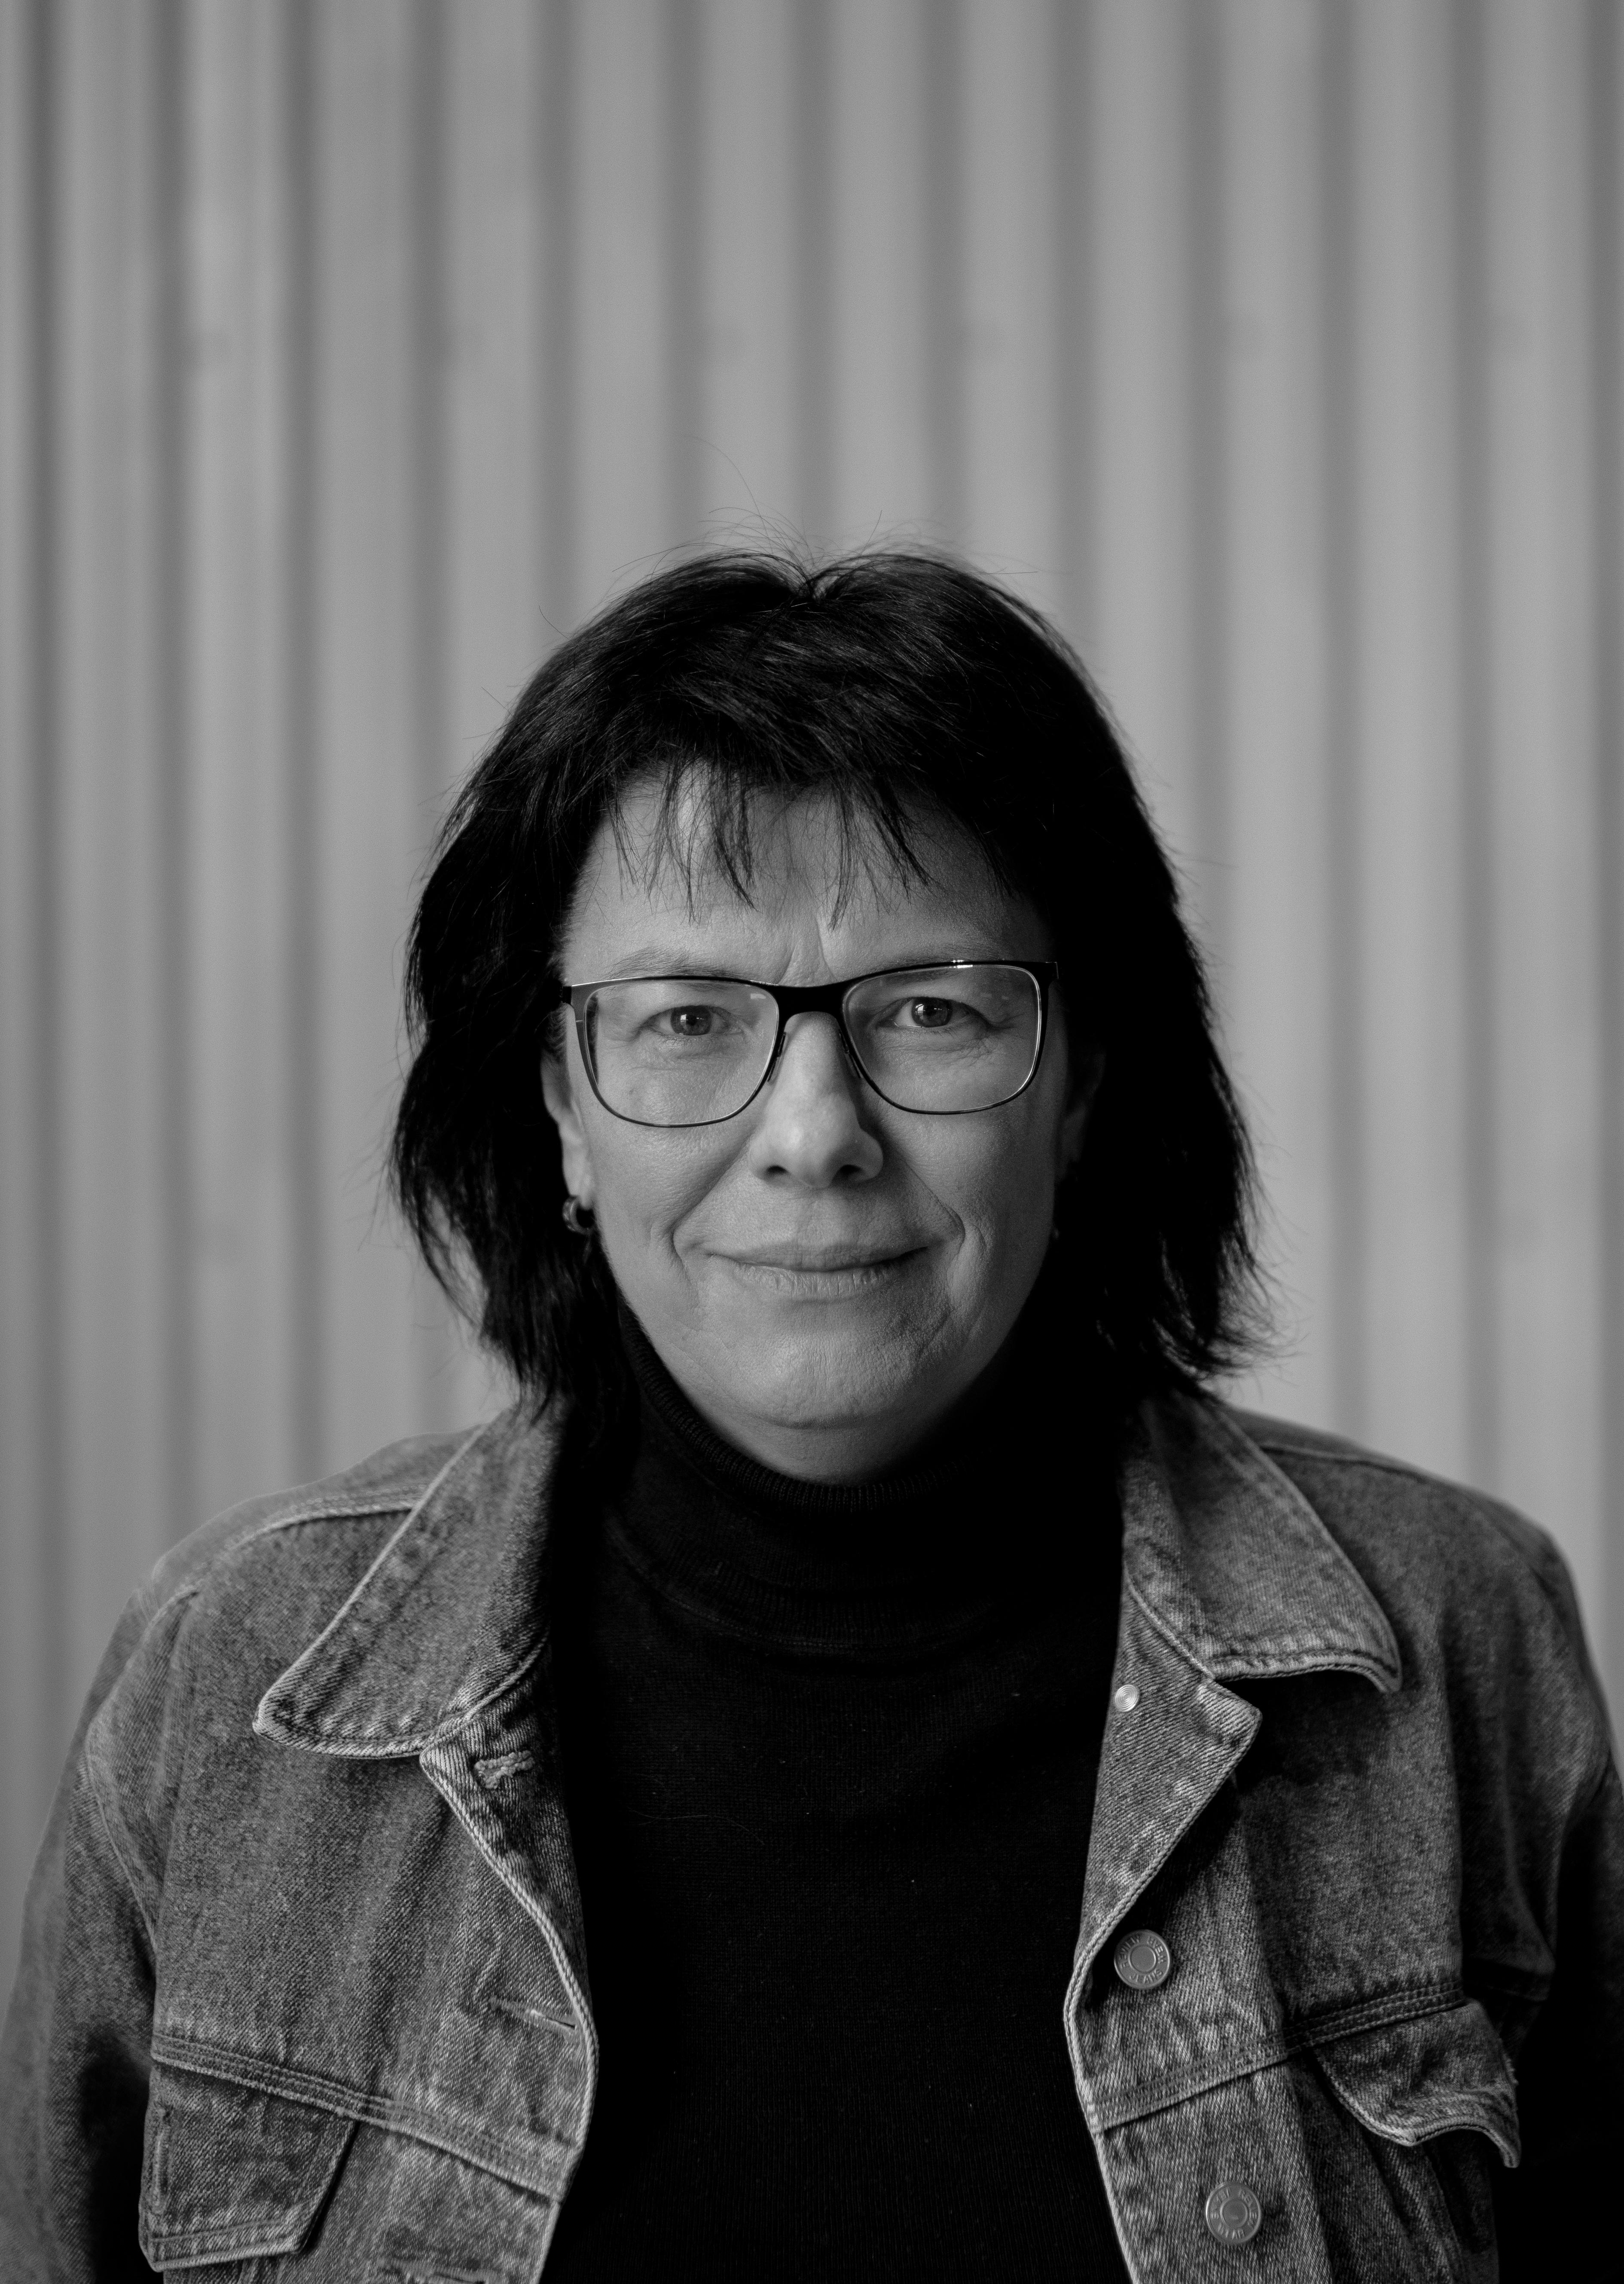 Marianne Borgström